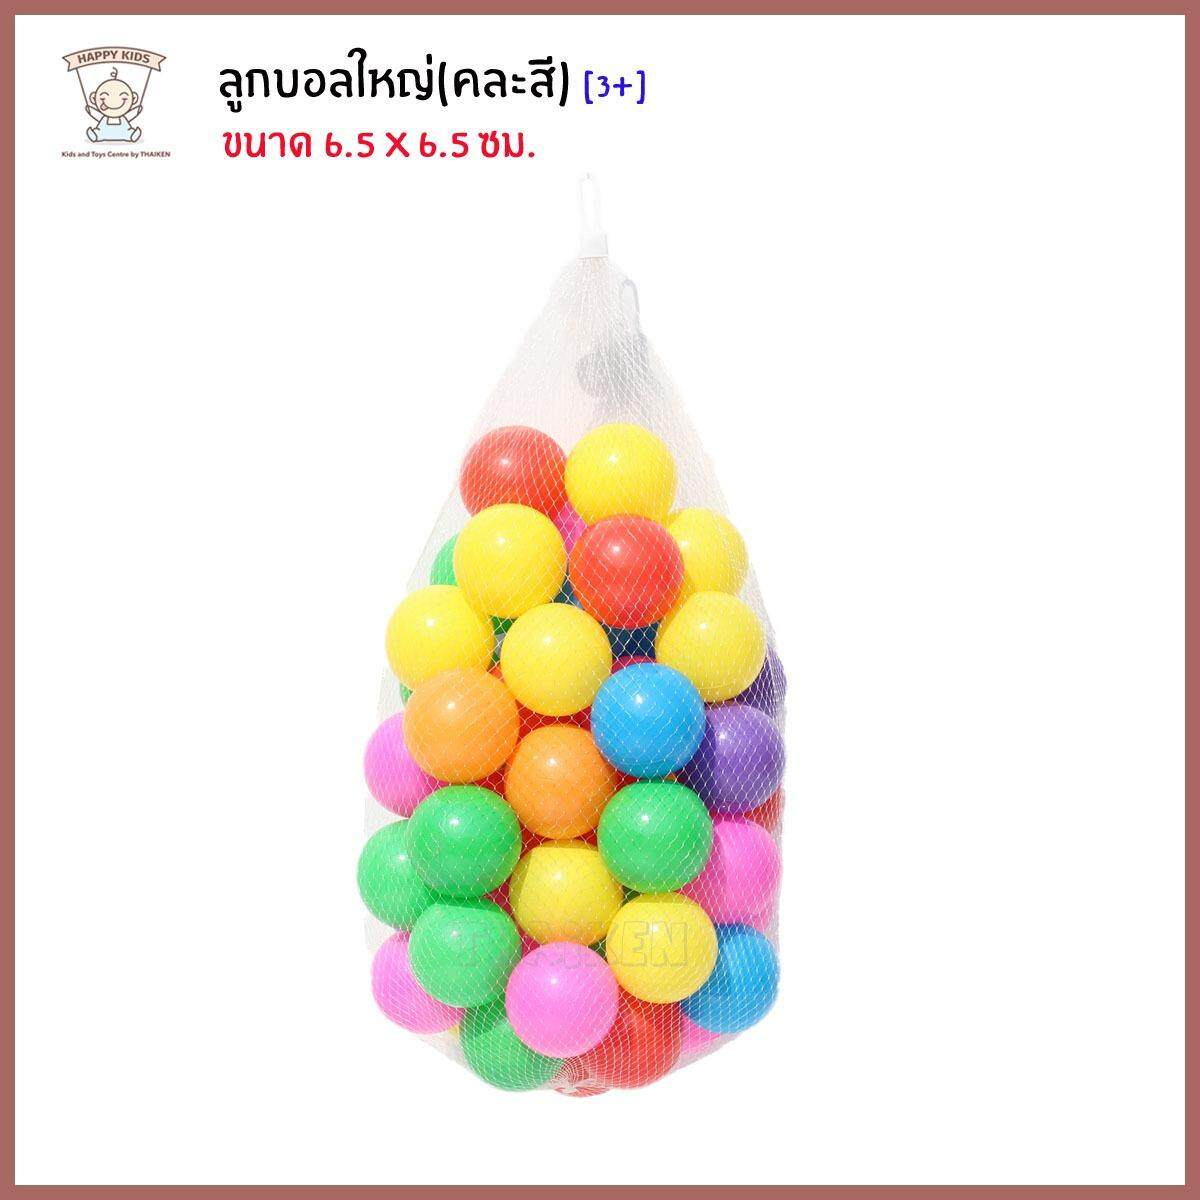 Thaiken บอล 50ลูก ลูกใหญ่ (คละสี) Ball 200big 200 บอล 50ลูก Ball-50 Utt01437 By Thaiken.